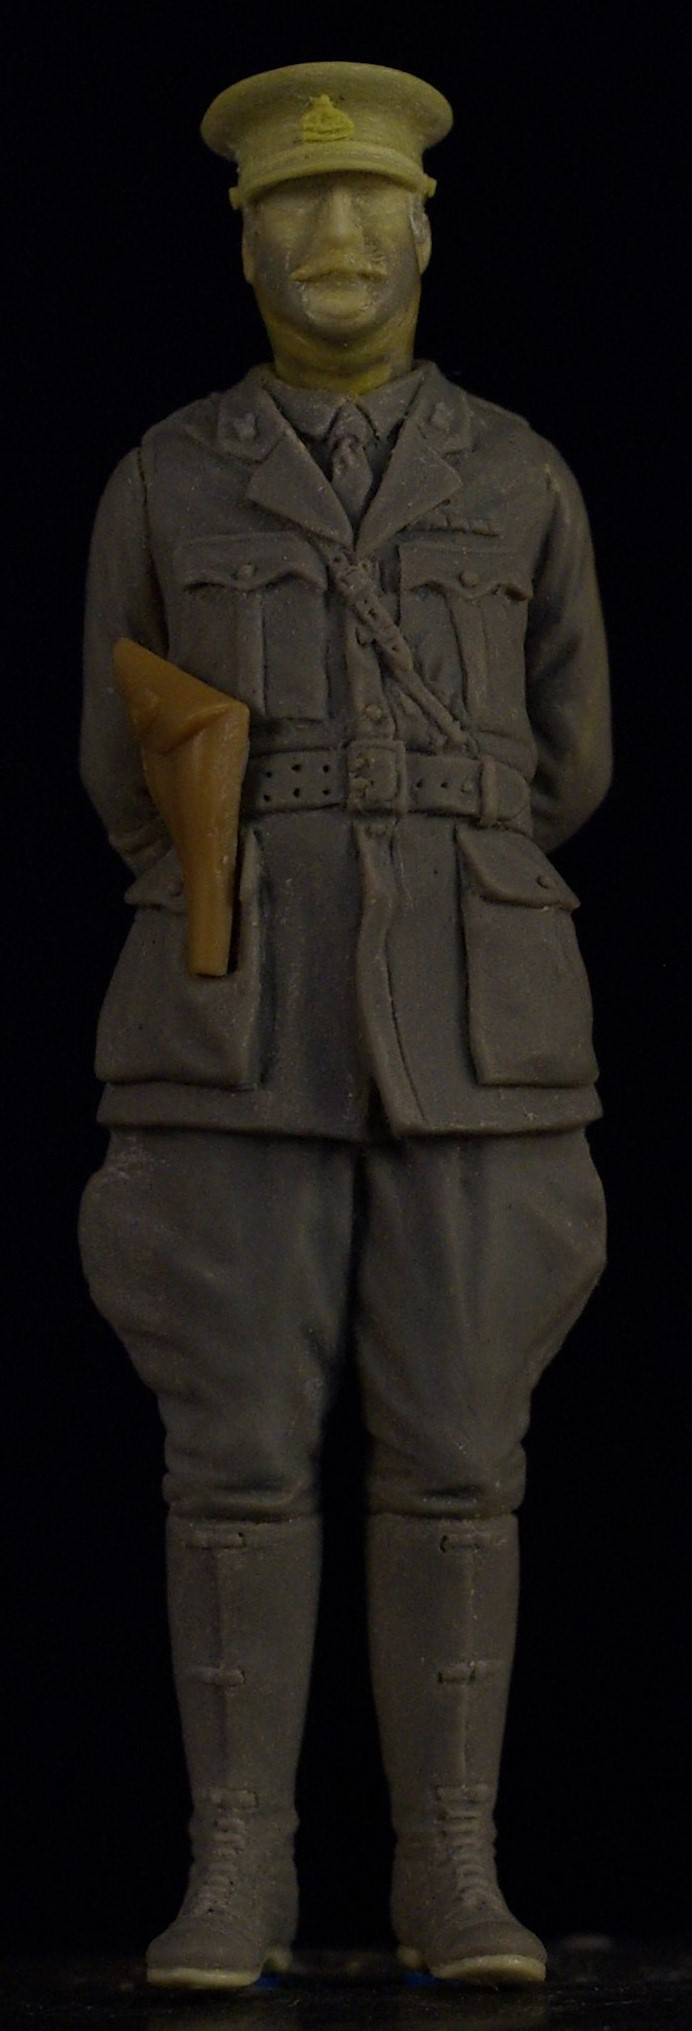 Le râleur, british officer WW1 - Page 2 _igp9113